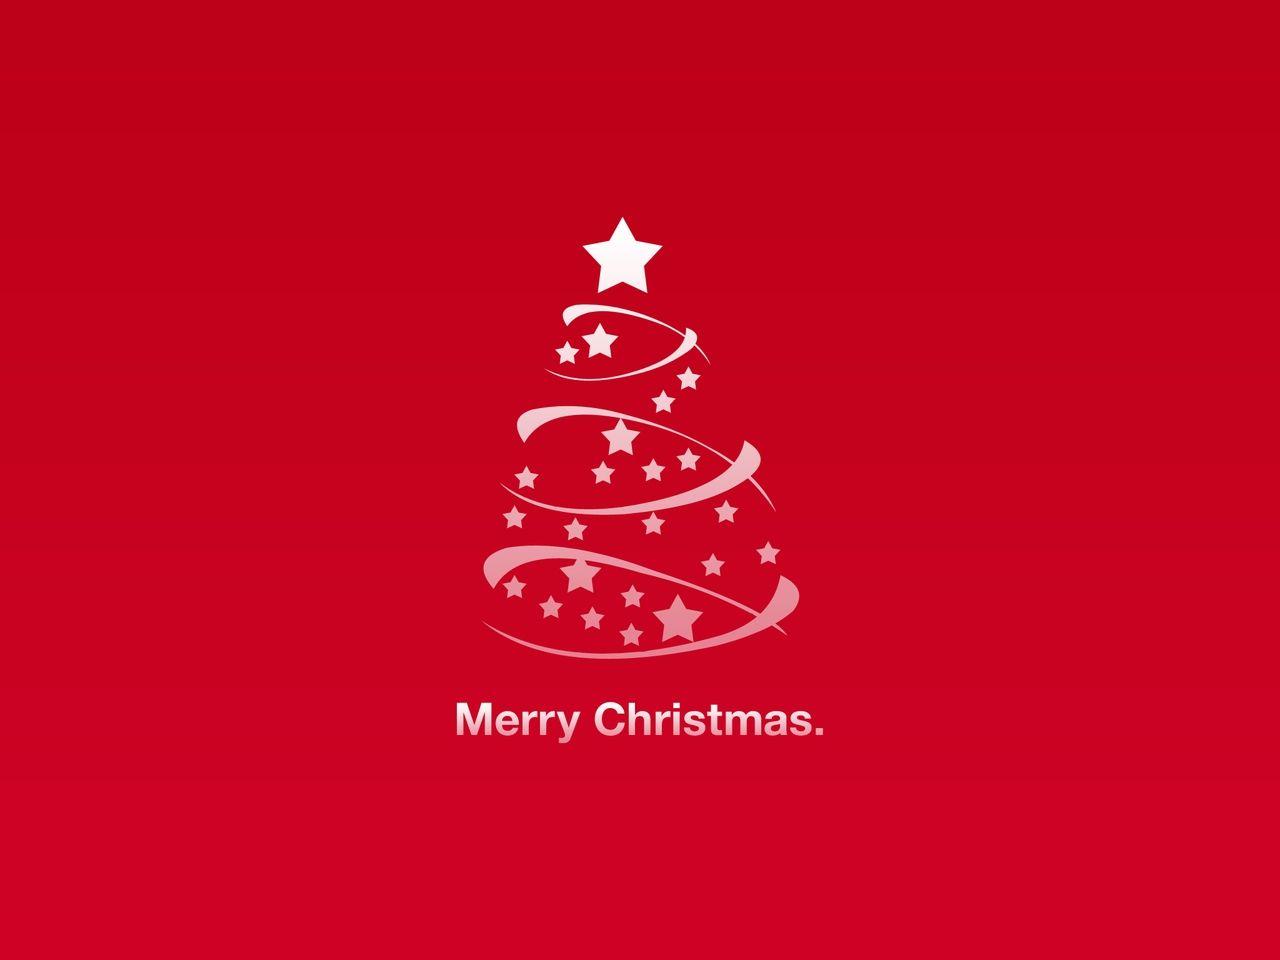 Merry Christmas By Theintenseplayer Merry Christmas Xmas Wallpaper Merry Xmas